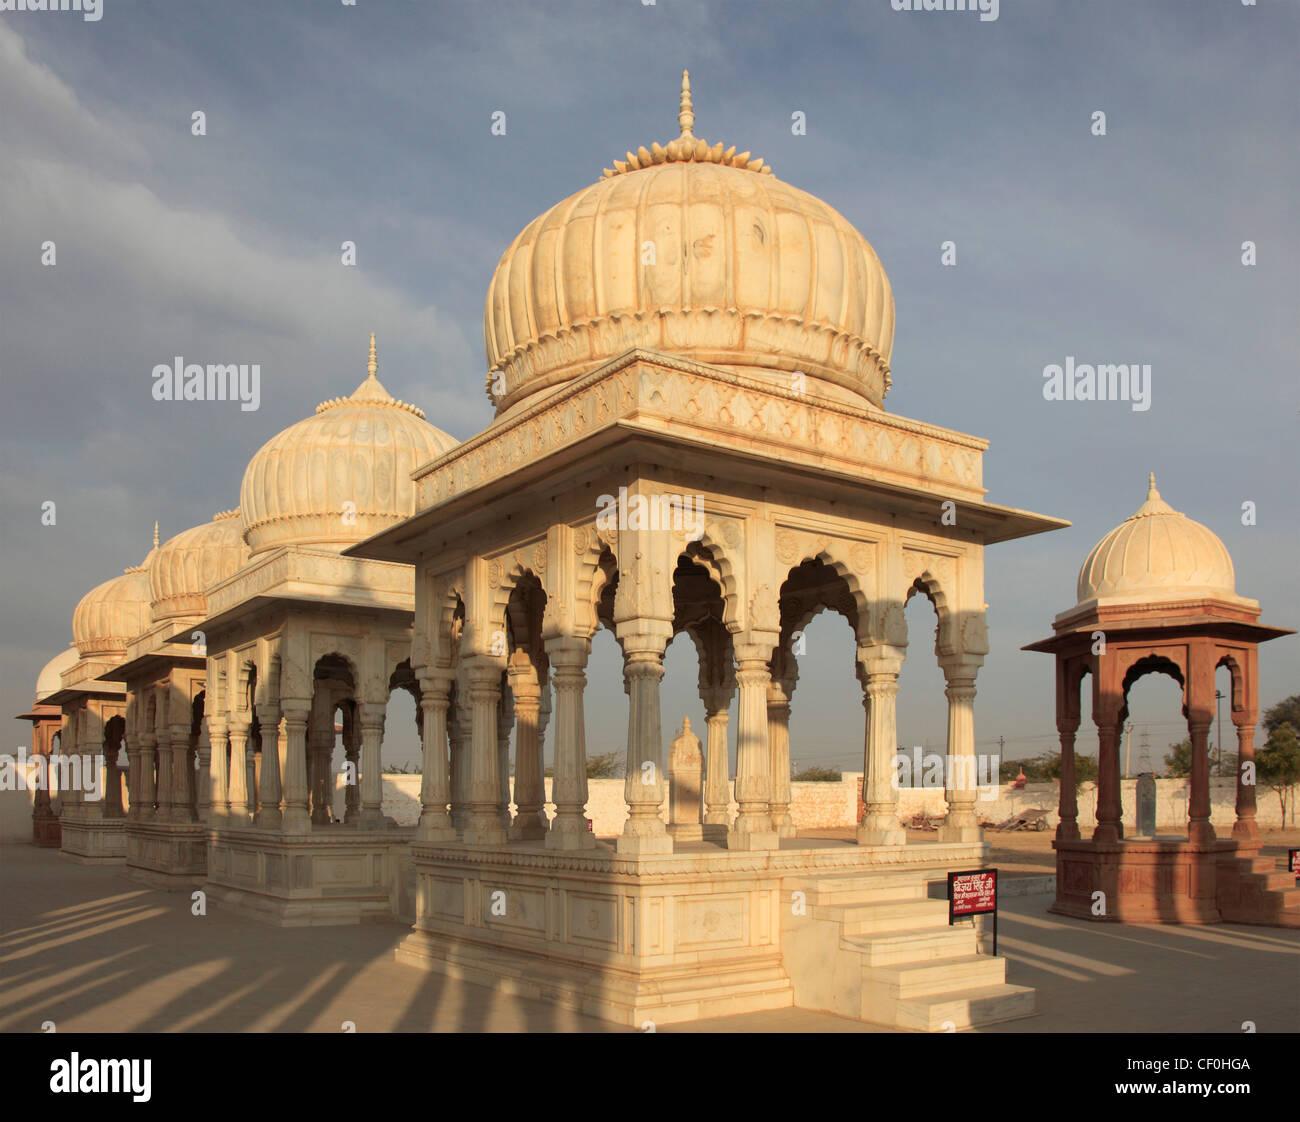 India, Rajasthan, Bikaner, Devi Kund, cenotaphs, - Stock Image